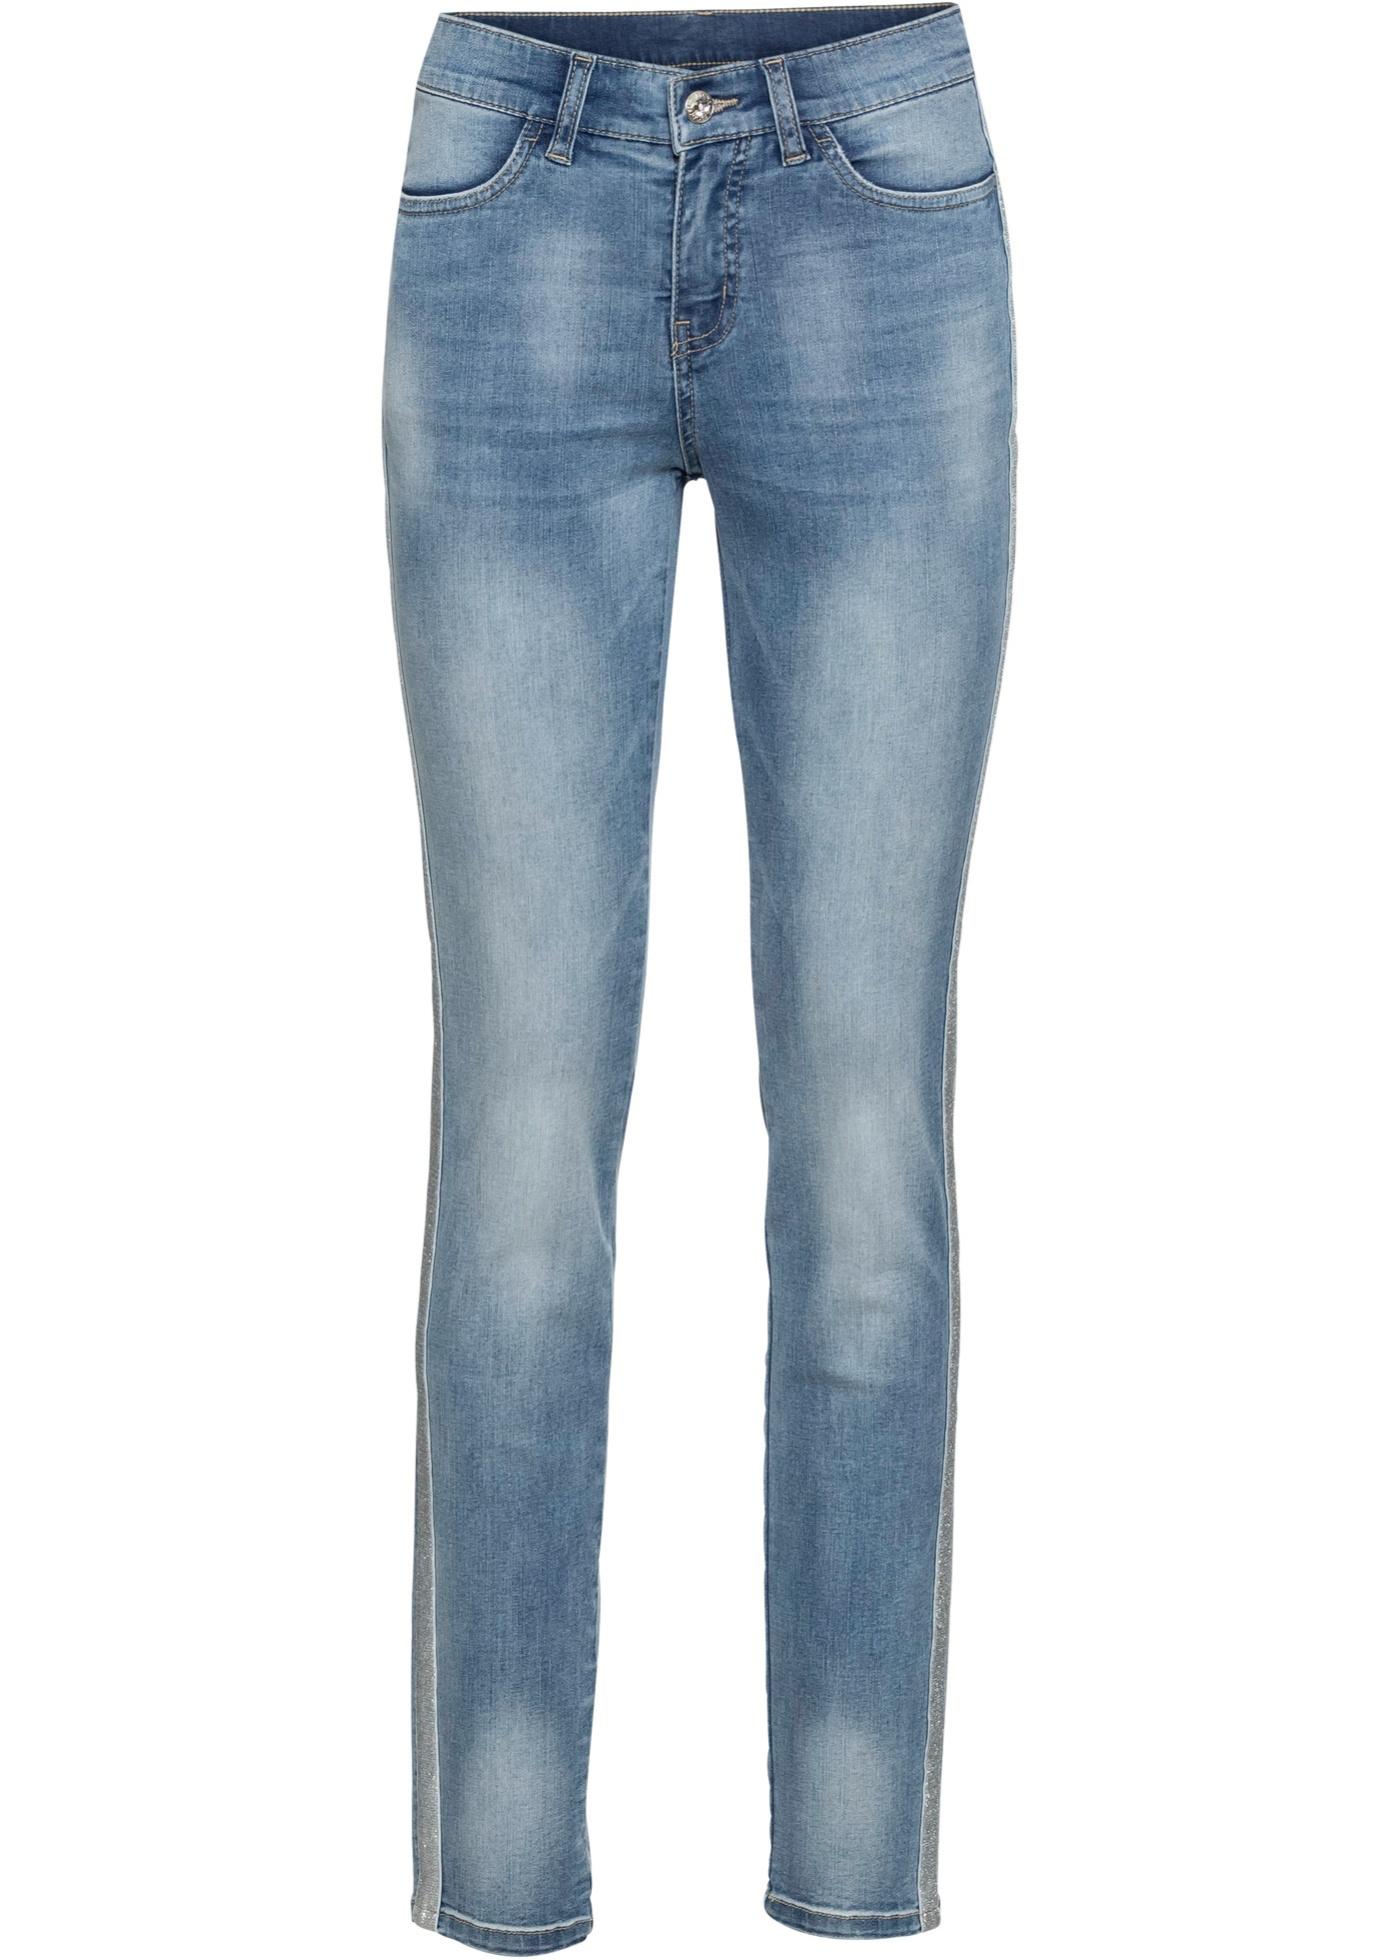 Bonprix - Jeans med glittrigt band i sidorna 449.00